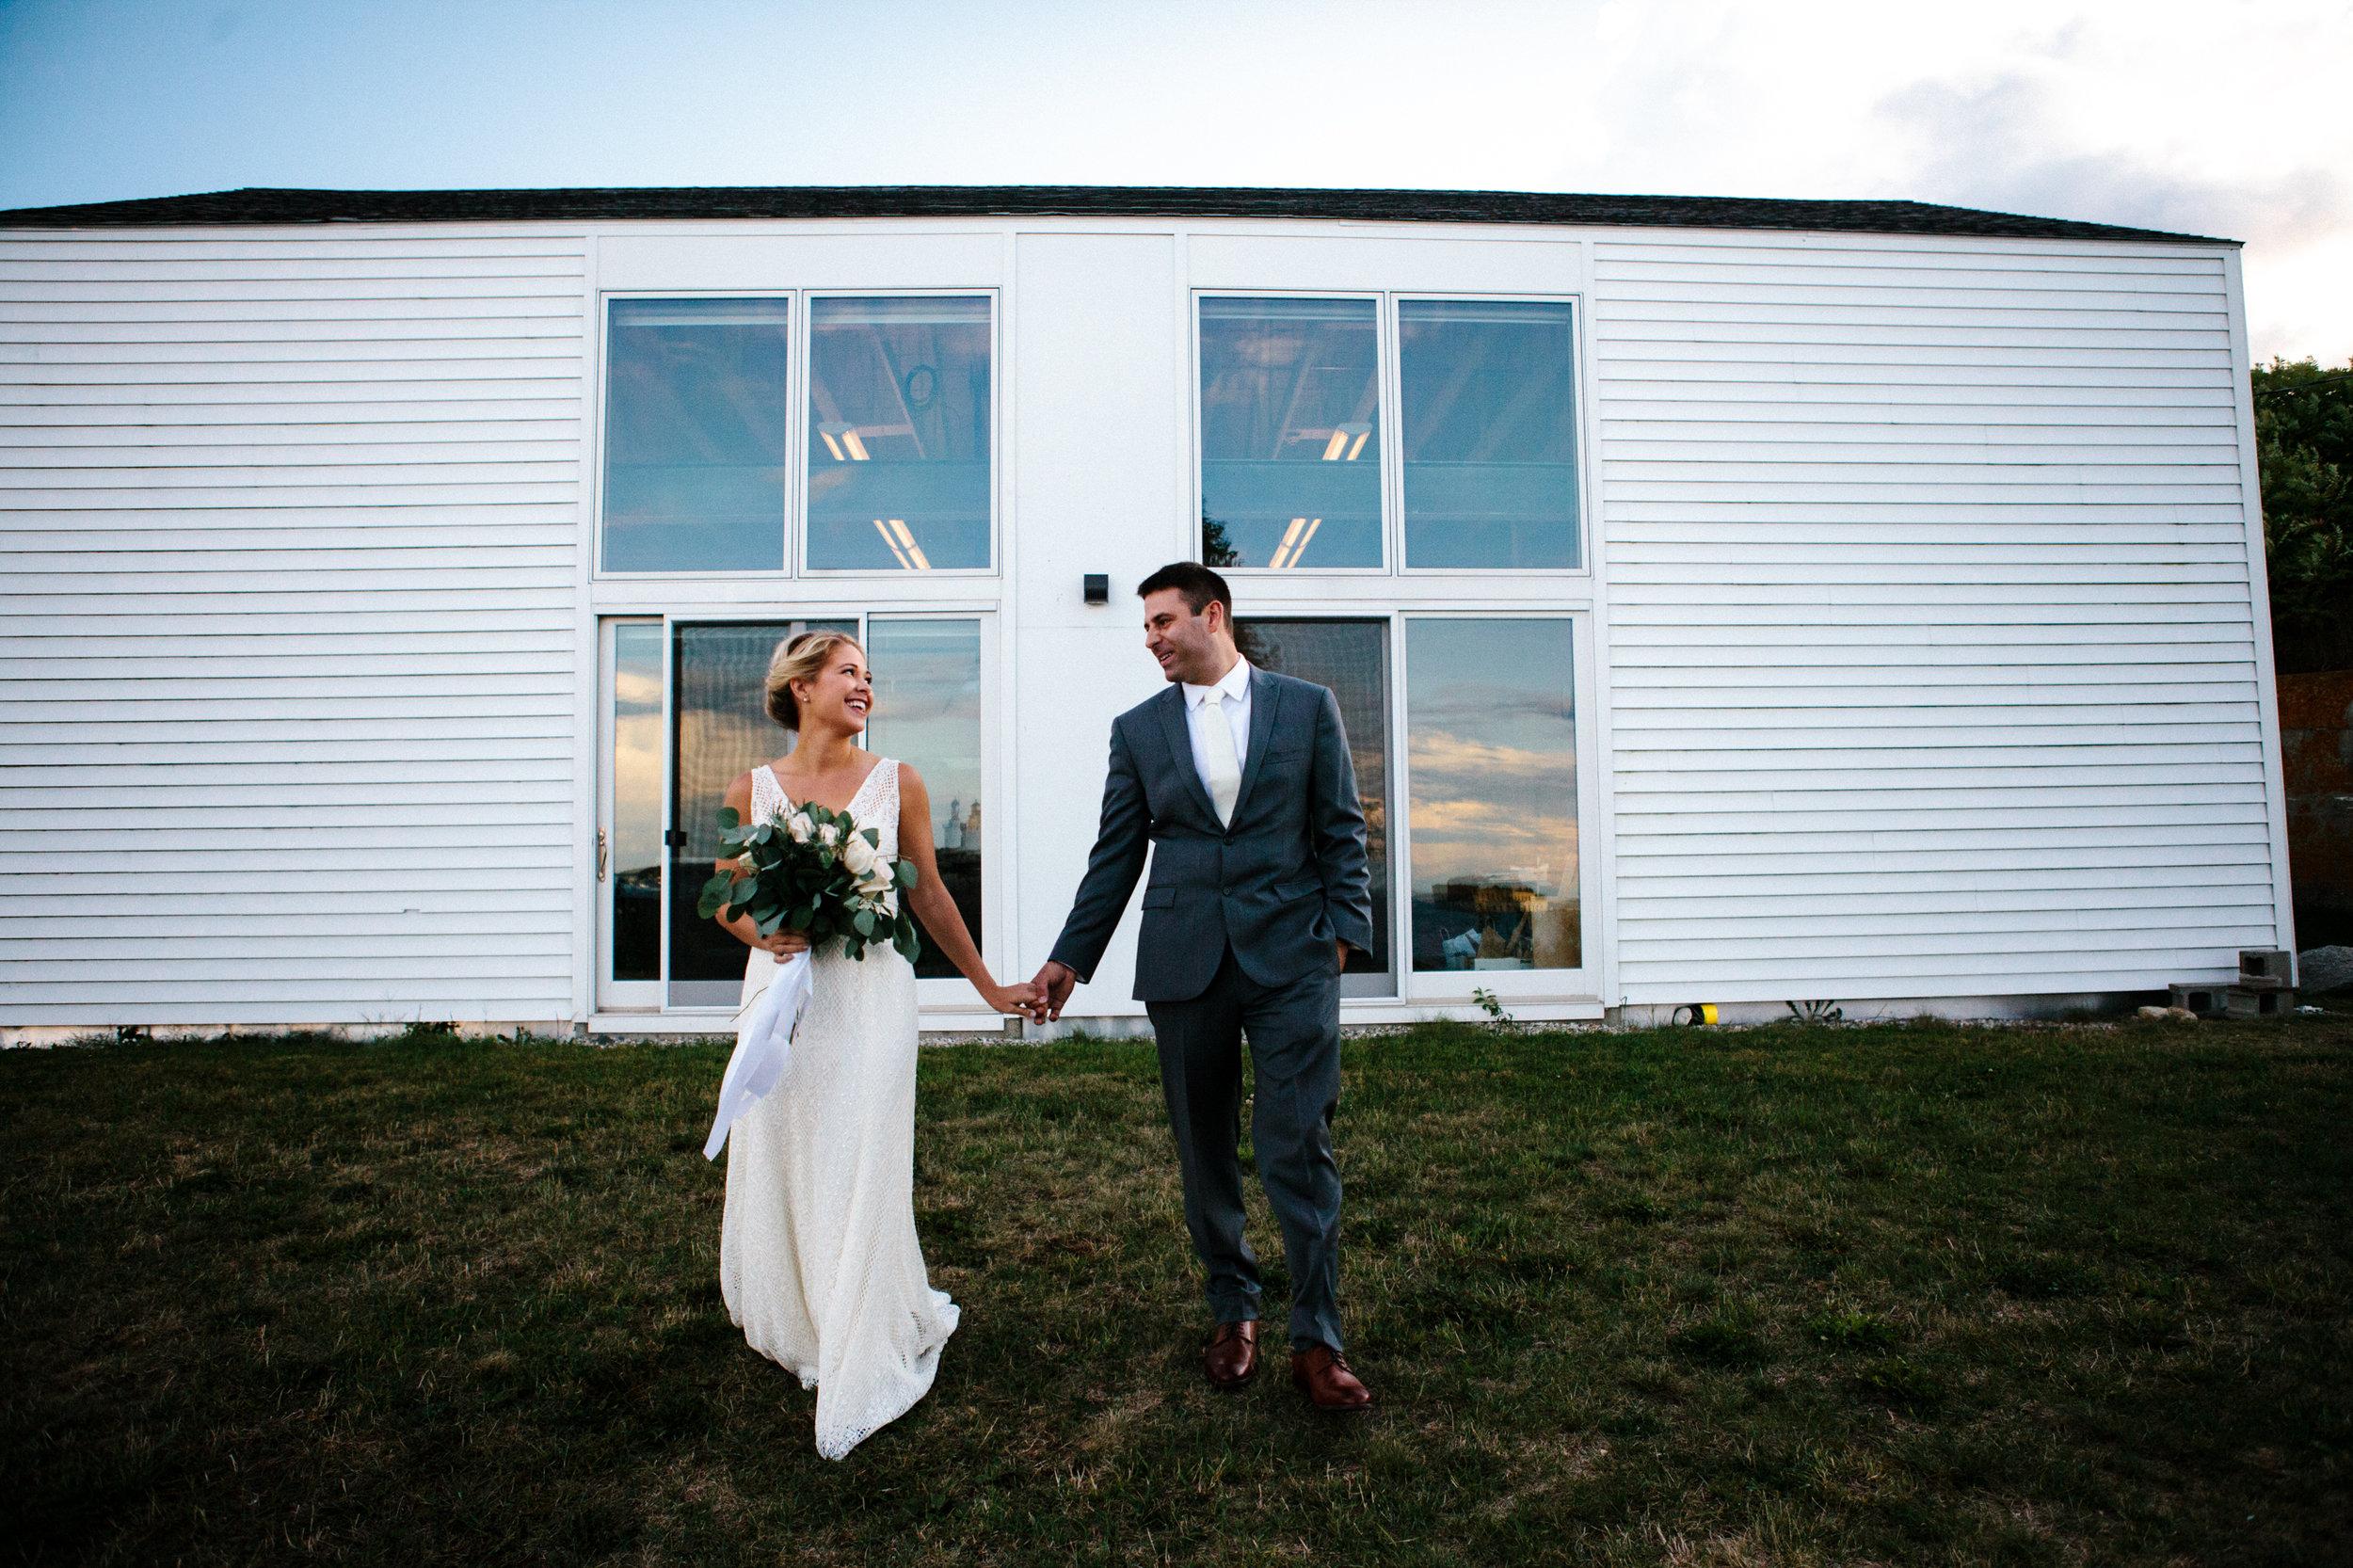 spring-point-ledge-lighthouse-wedding-south-portland-maine-2816.jpg